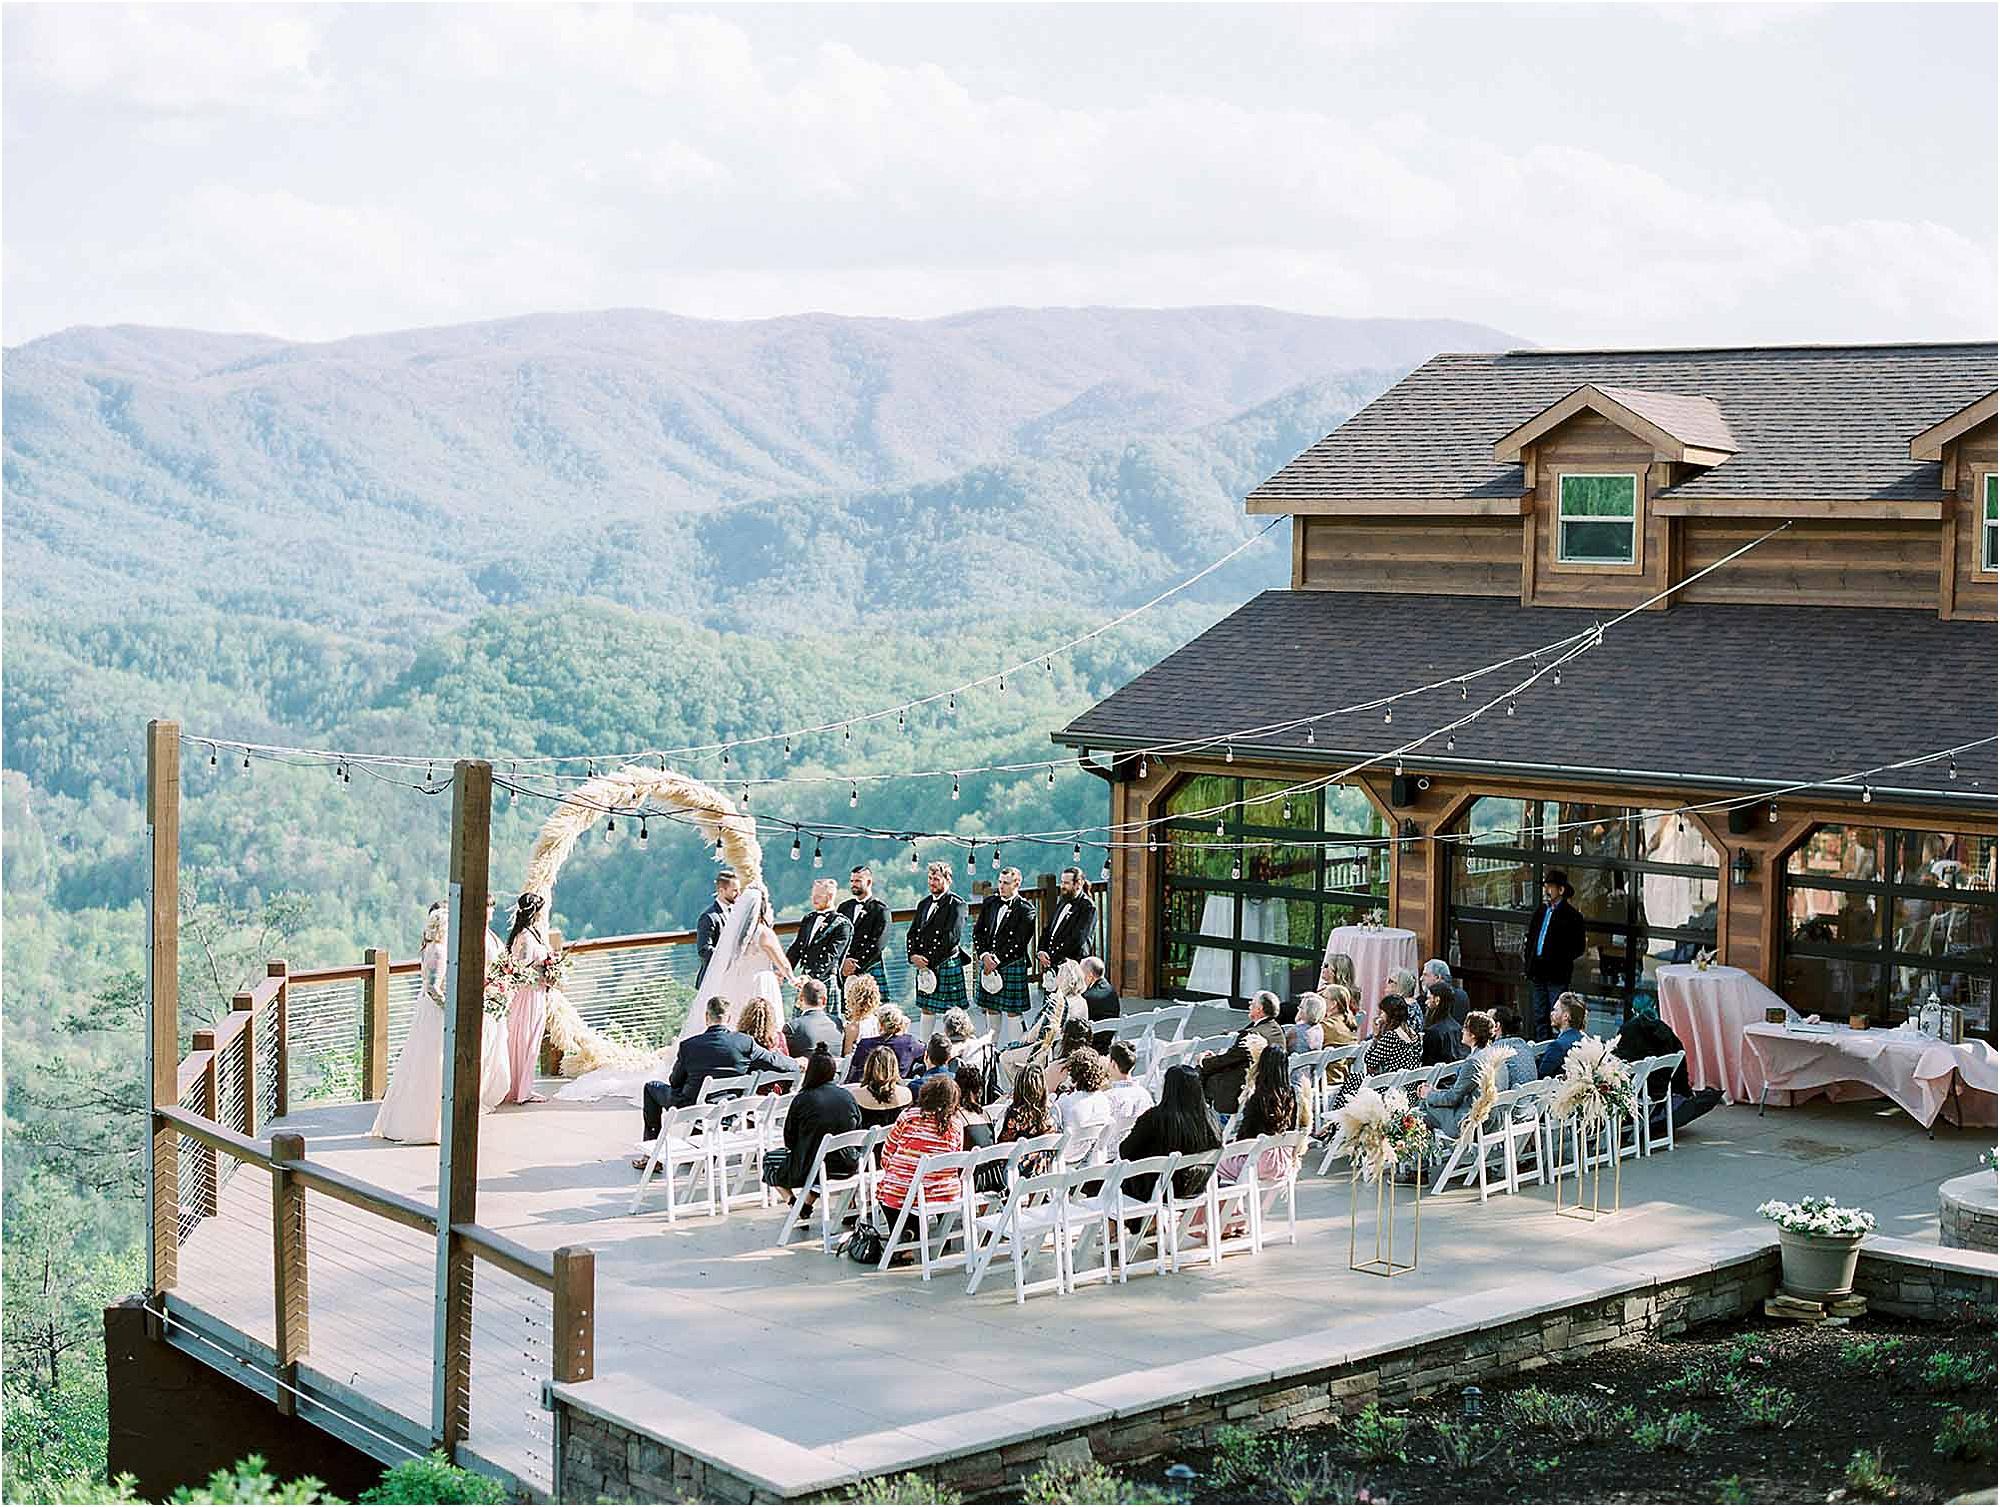 Scottish Wedding Ceremony at The Magnolia Venue